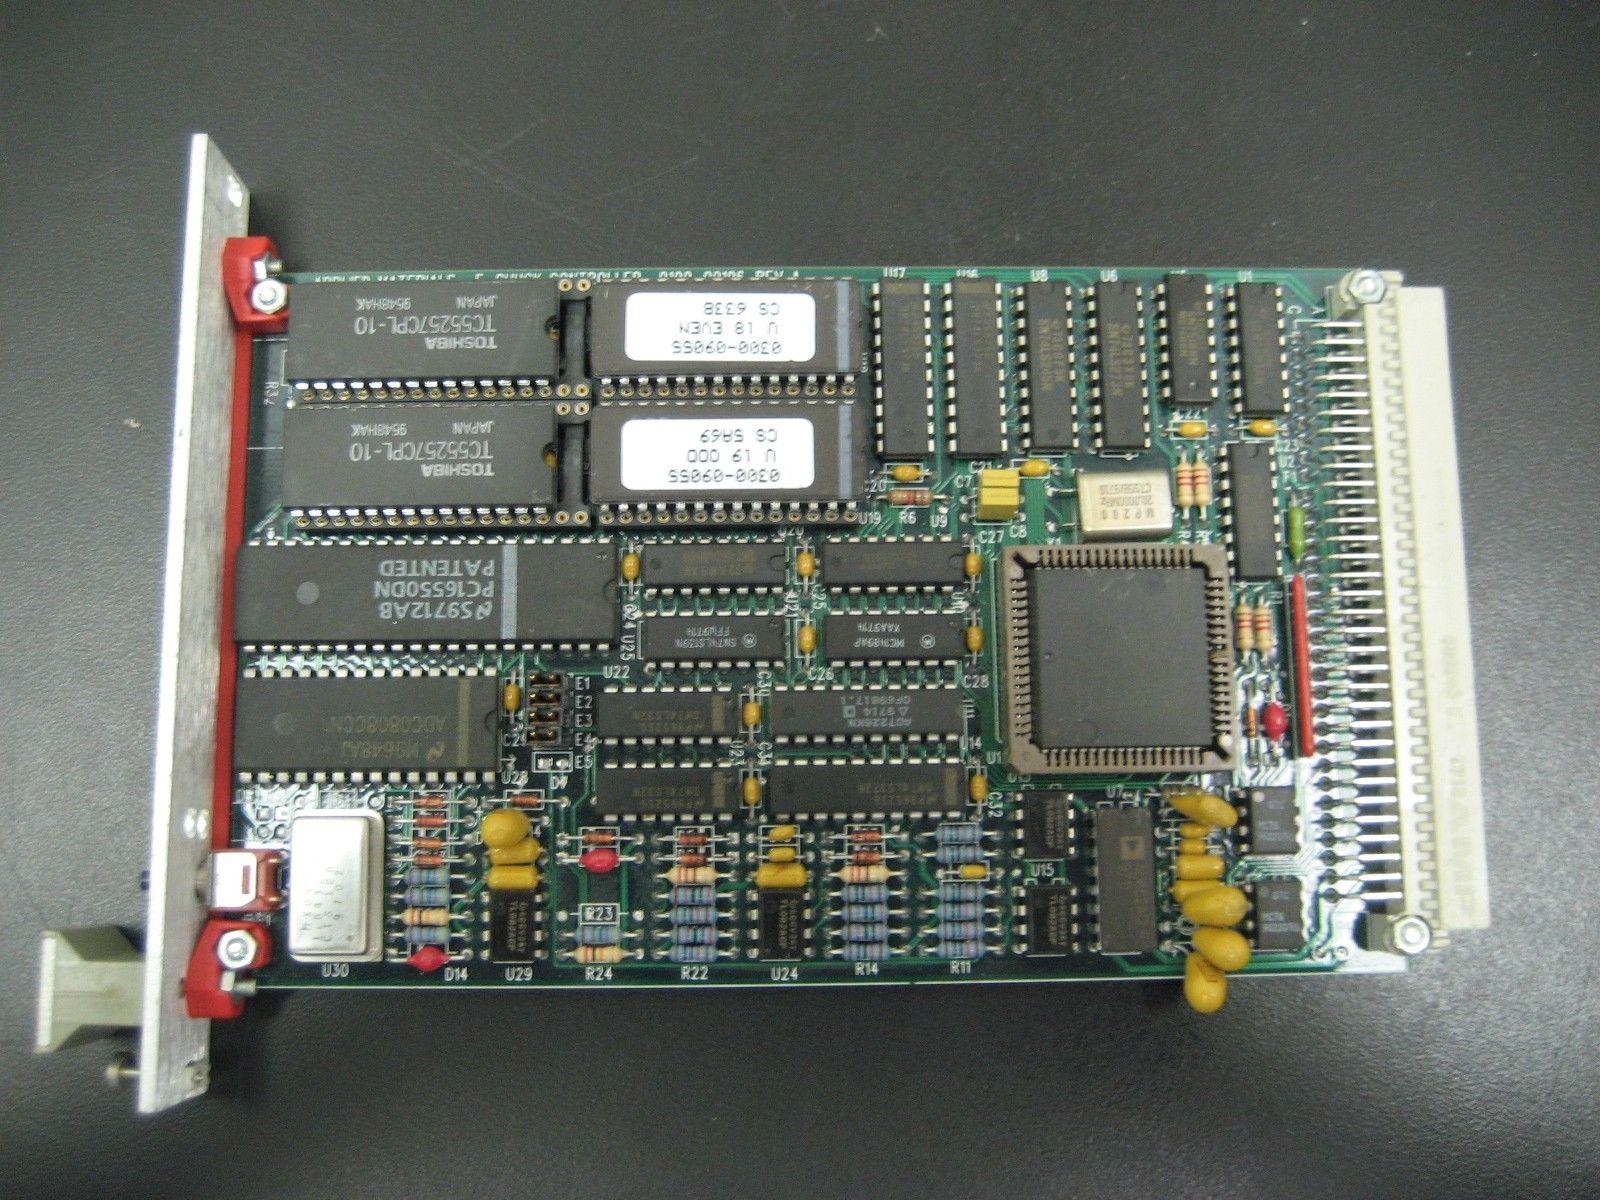 E CHUCK CONTROLLER ASSY PCB 0100-09196